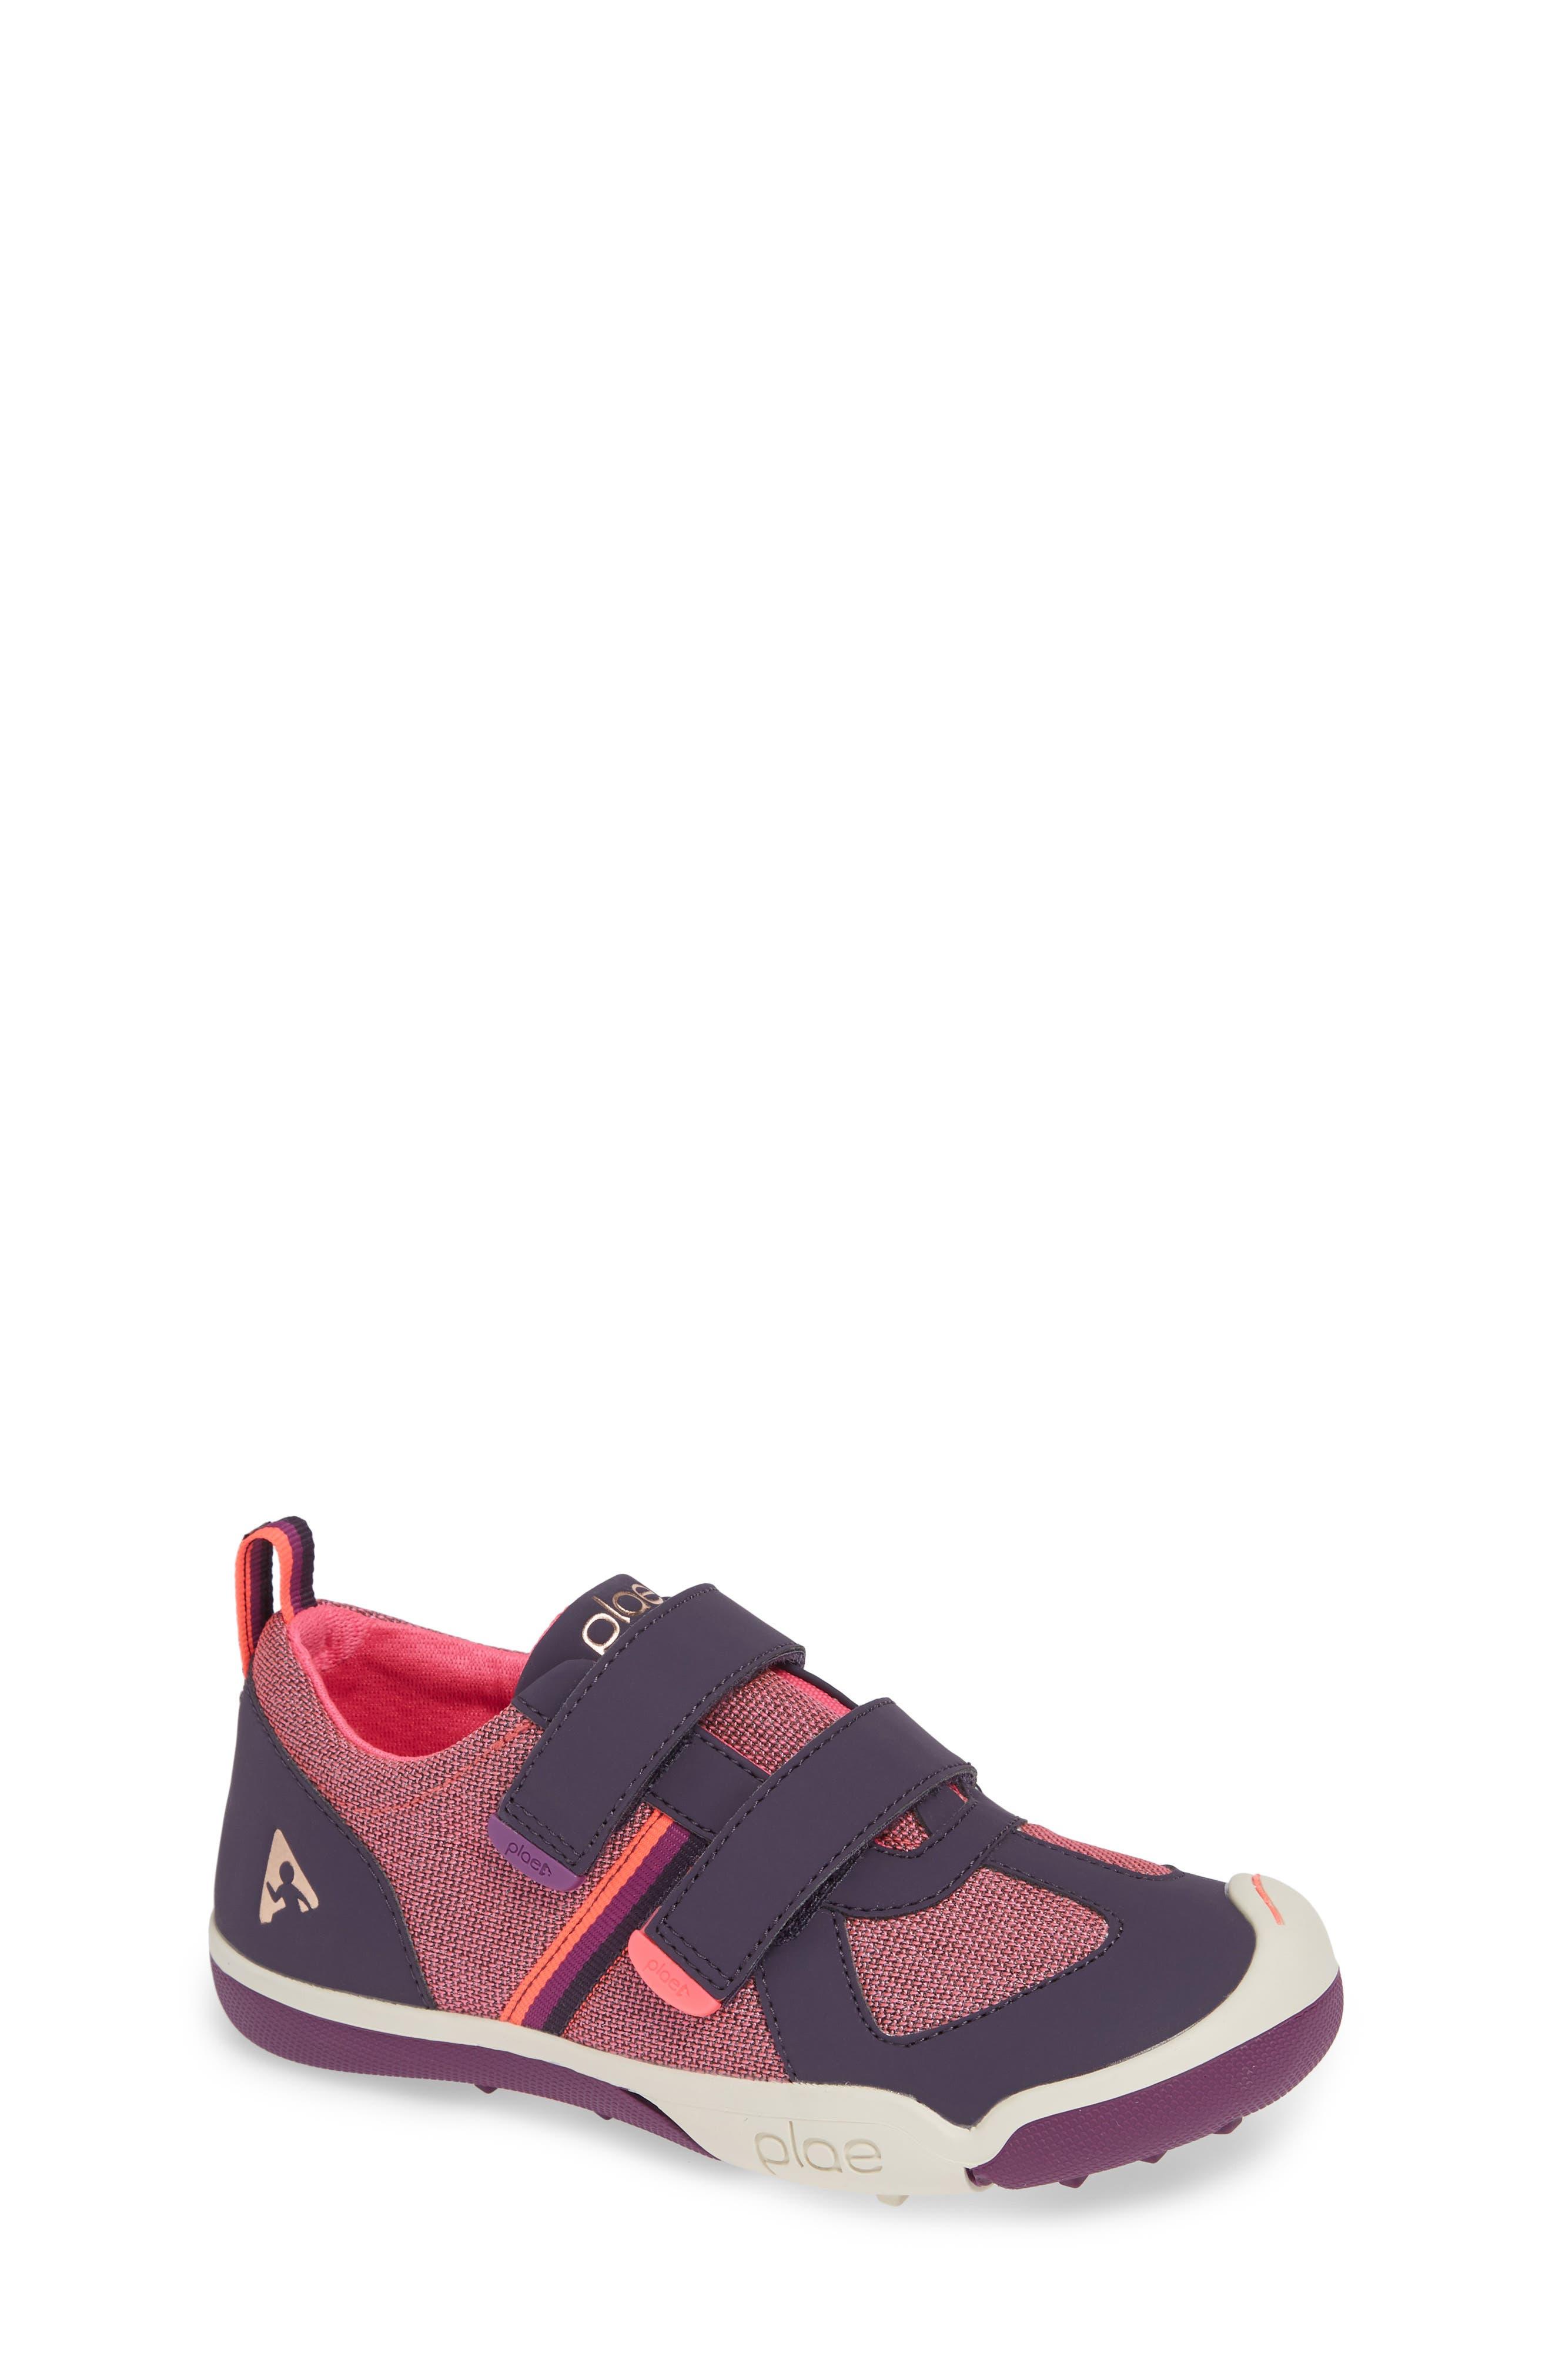 Charlie Customizable Waterproof Sneaker,                         Main,                         color, MYSTIC BERRY